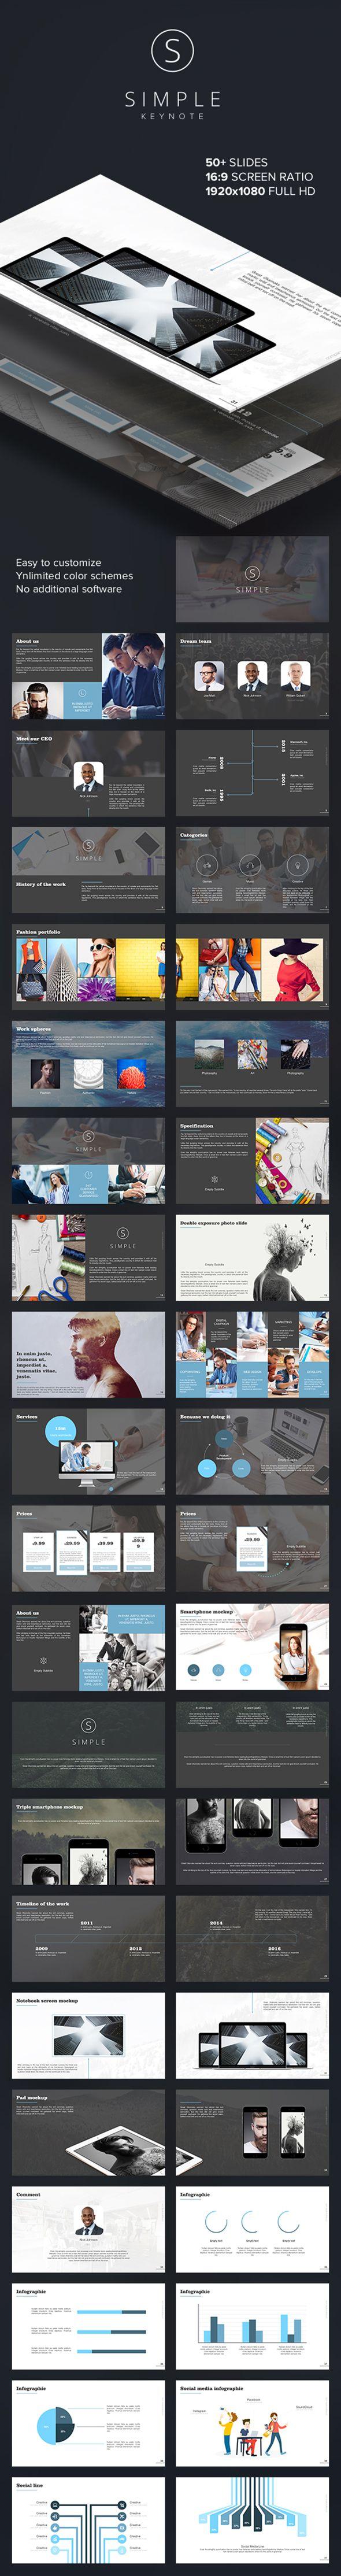 SIMPLE Keynote Template. Download here: http://graphicriver.net/item/simple-keynote-template/15802459?ref=ksioks